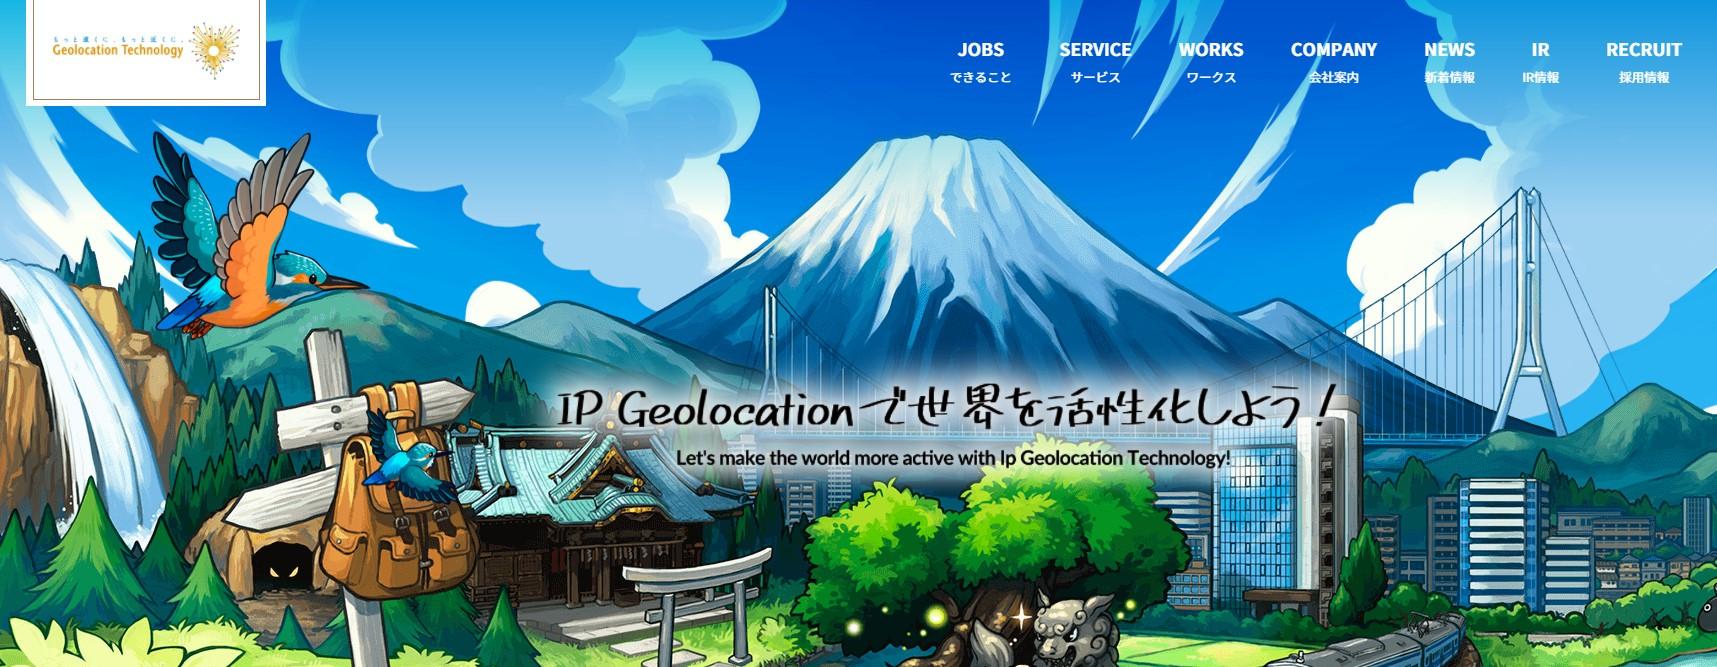 Geolocation Technology(4018)IPO